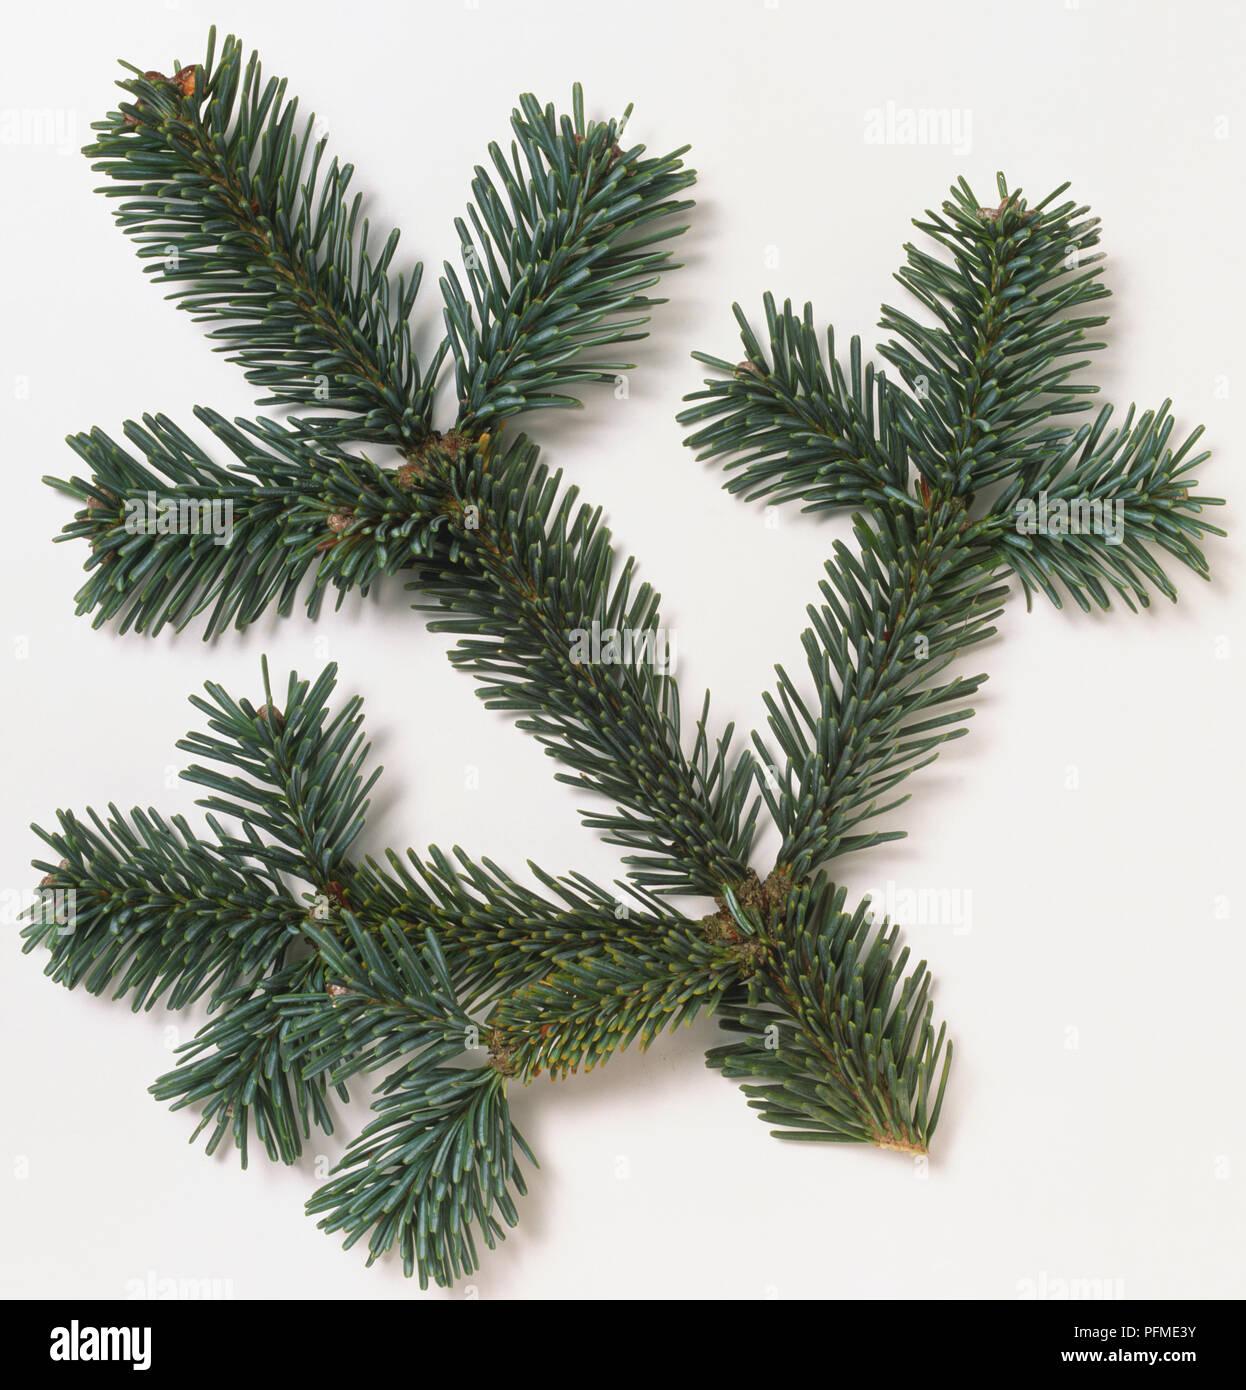 Pinaceae Abies Lasiocarpa Var Arizonica Compacta Subalpine Fir